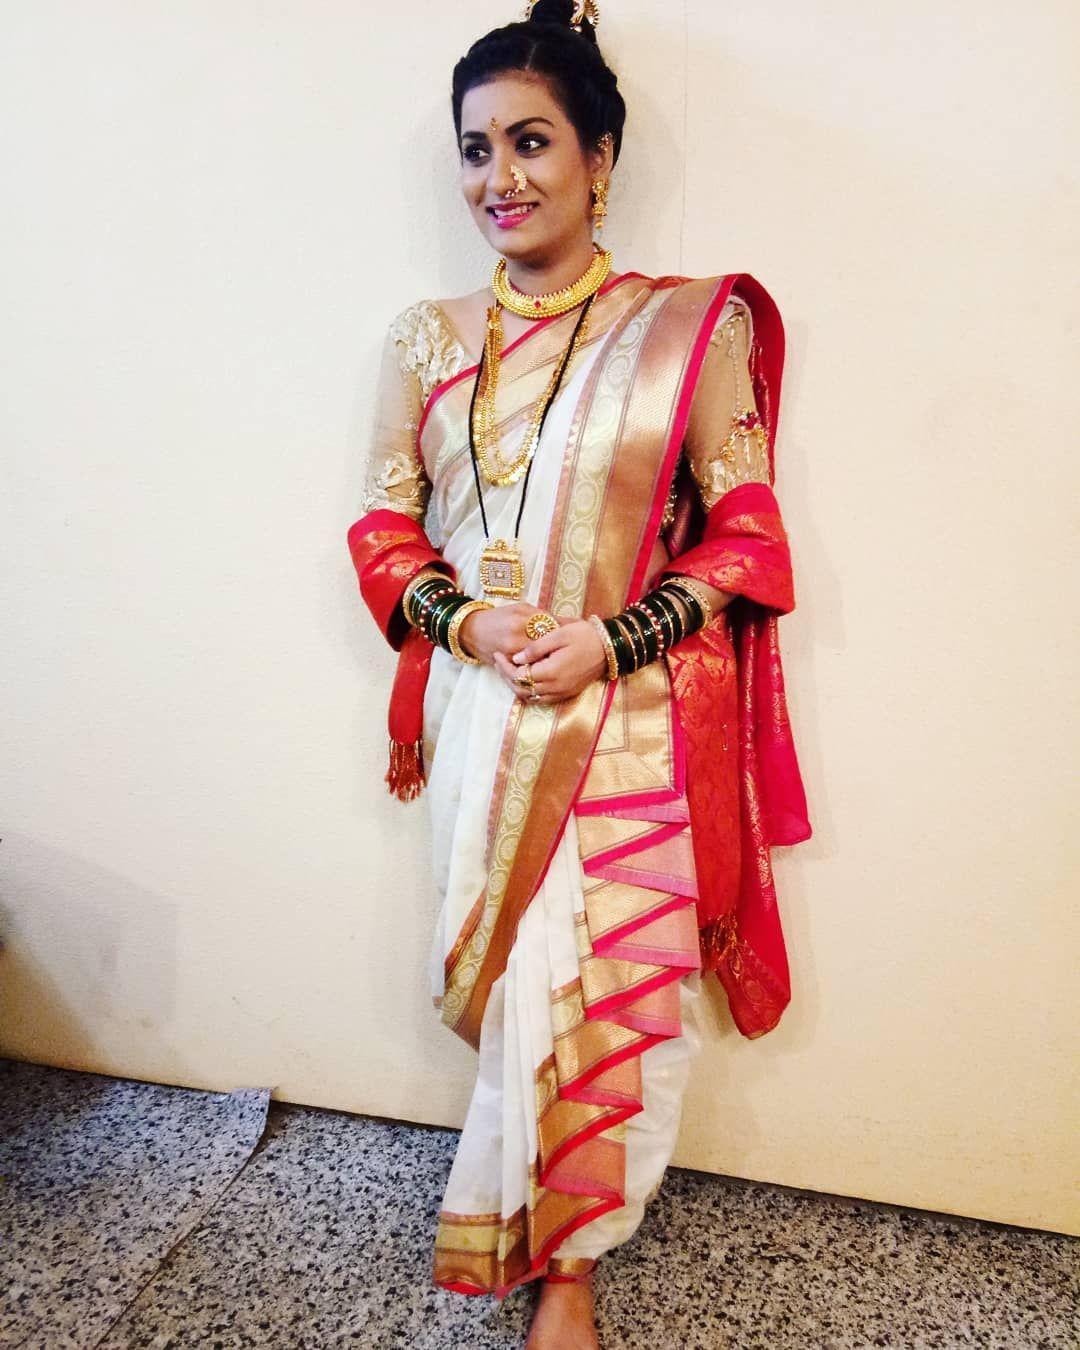 Aajcha Ranga Pandhare Fharach Late Jhala Nai Wedding Saree Blouse Designs Lehenga Saree Design Saree Dress